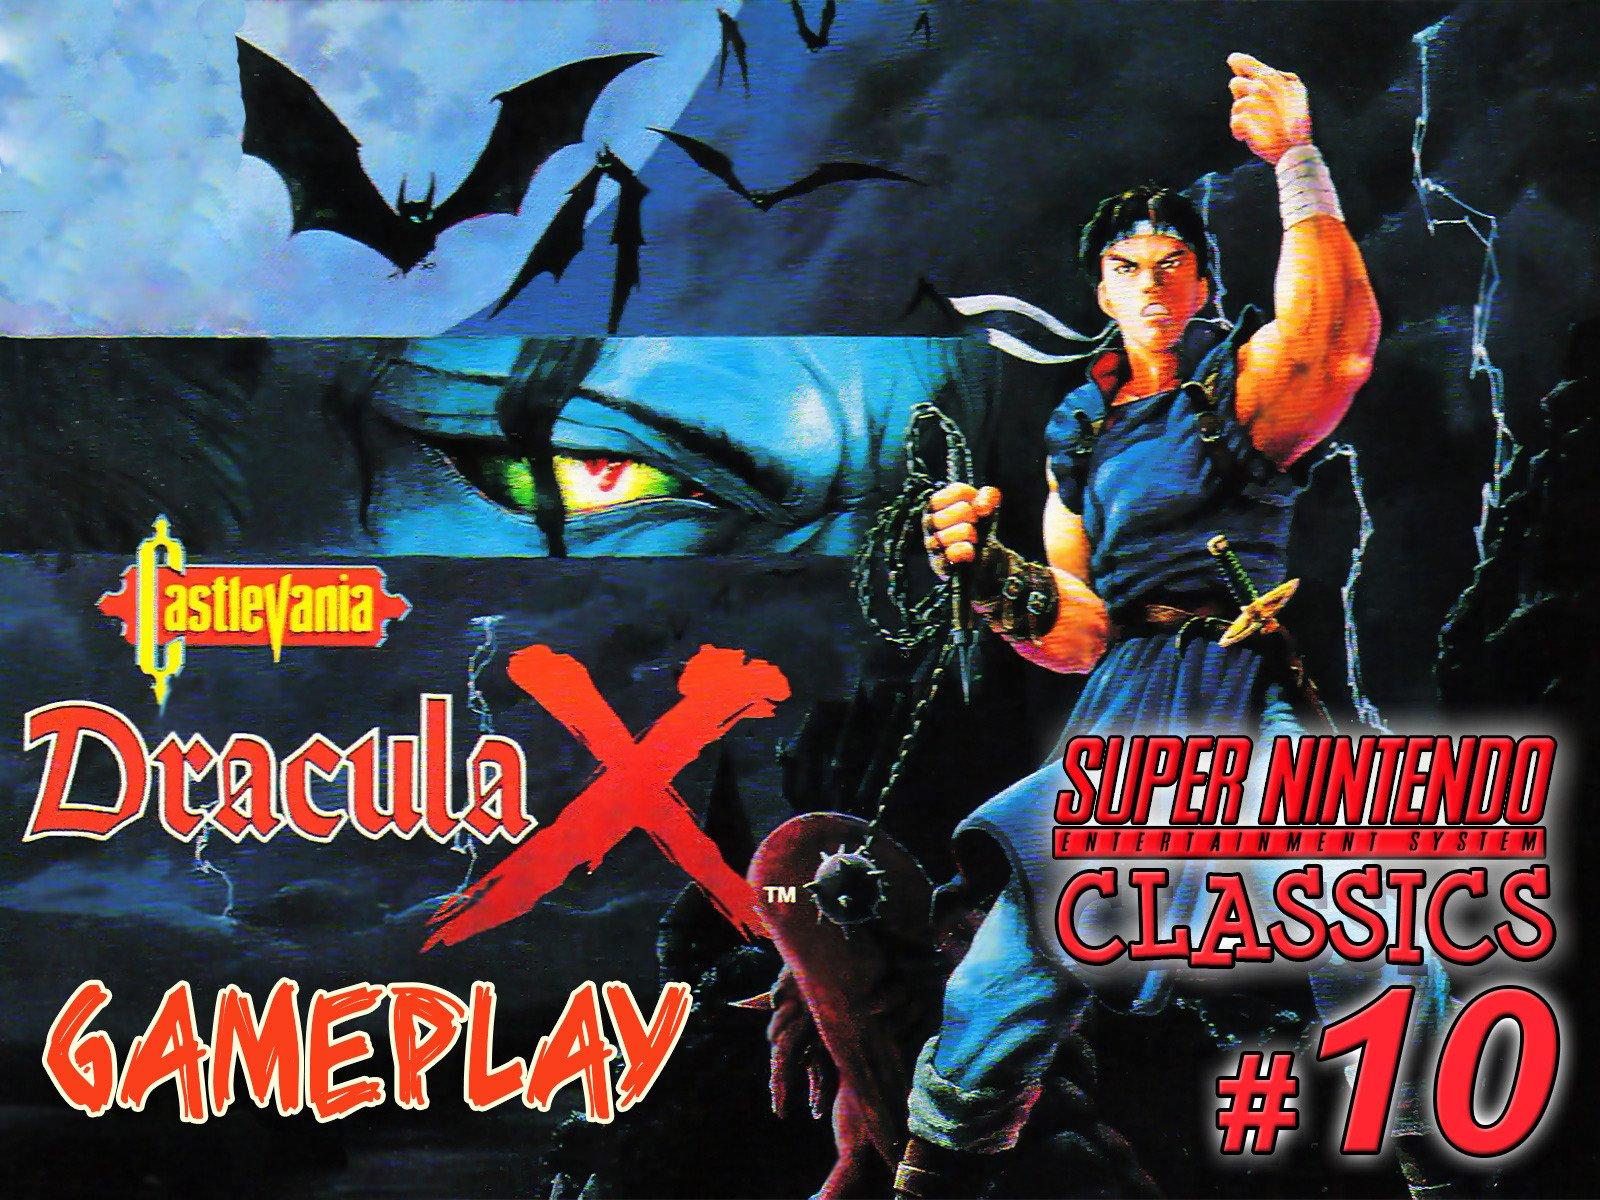 Clip: Castlevania Dracula X Gameplay (SNES Classics 10) - Season 1